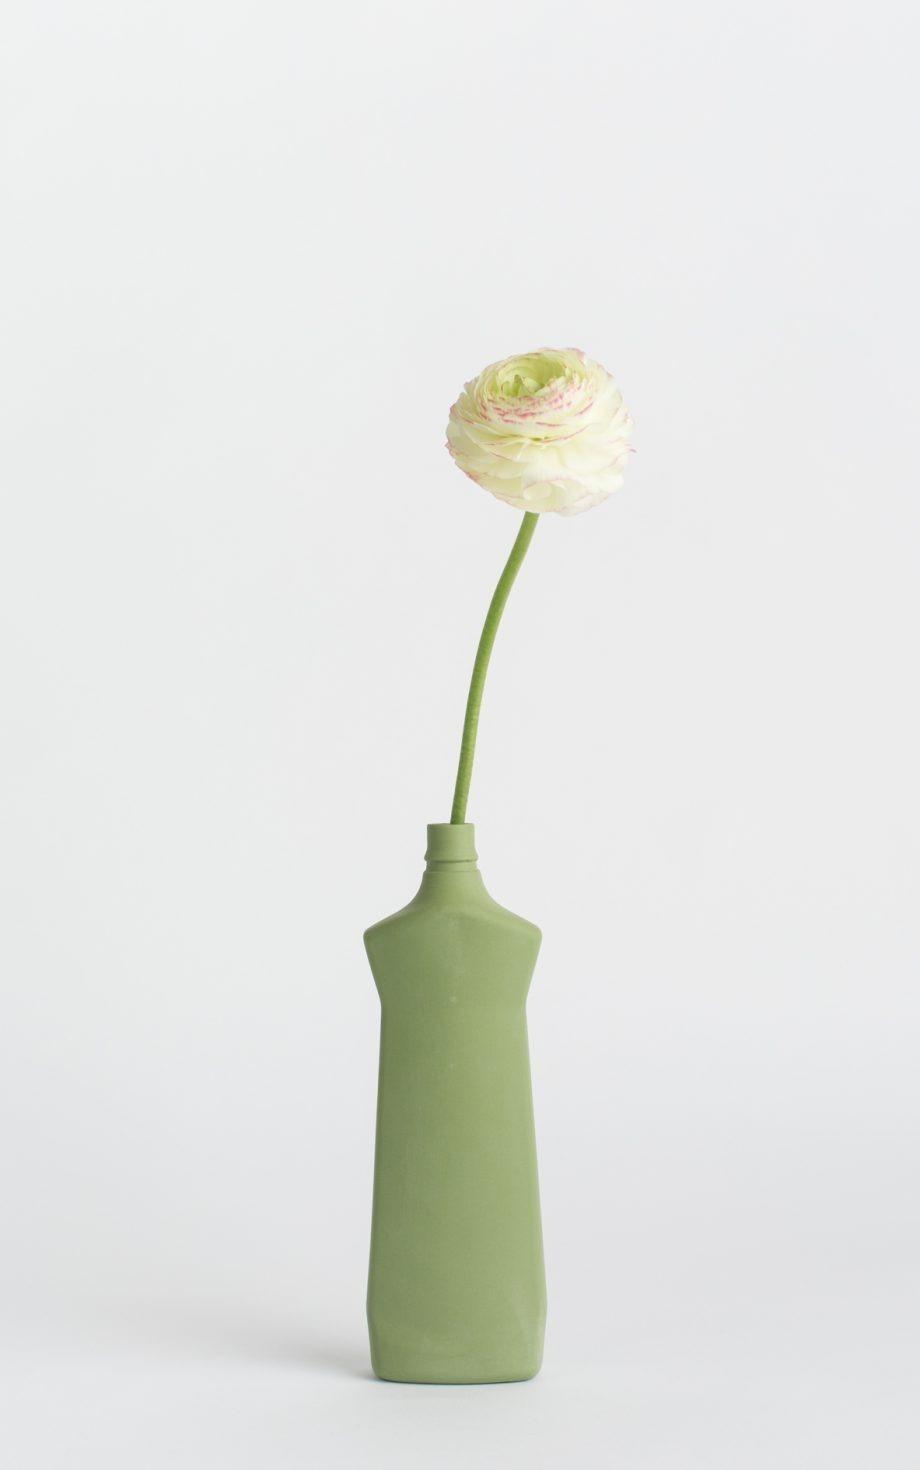 bottle vase #1 dark green with flower